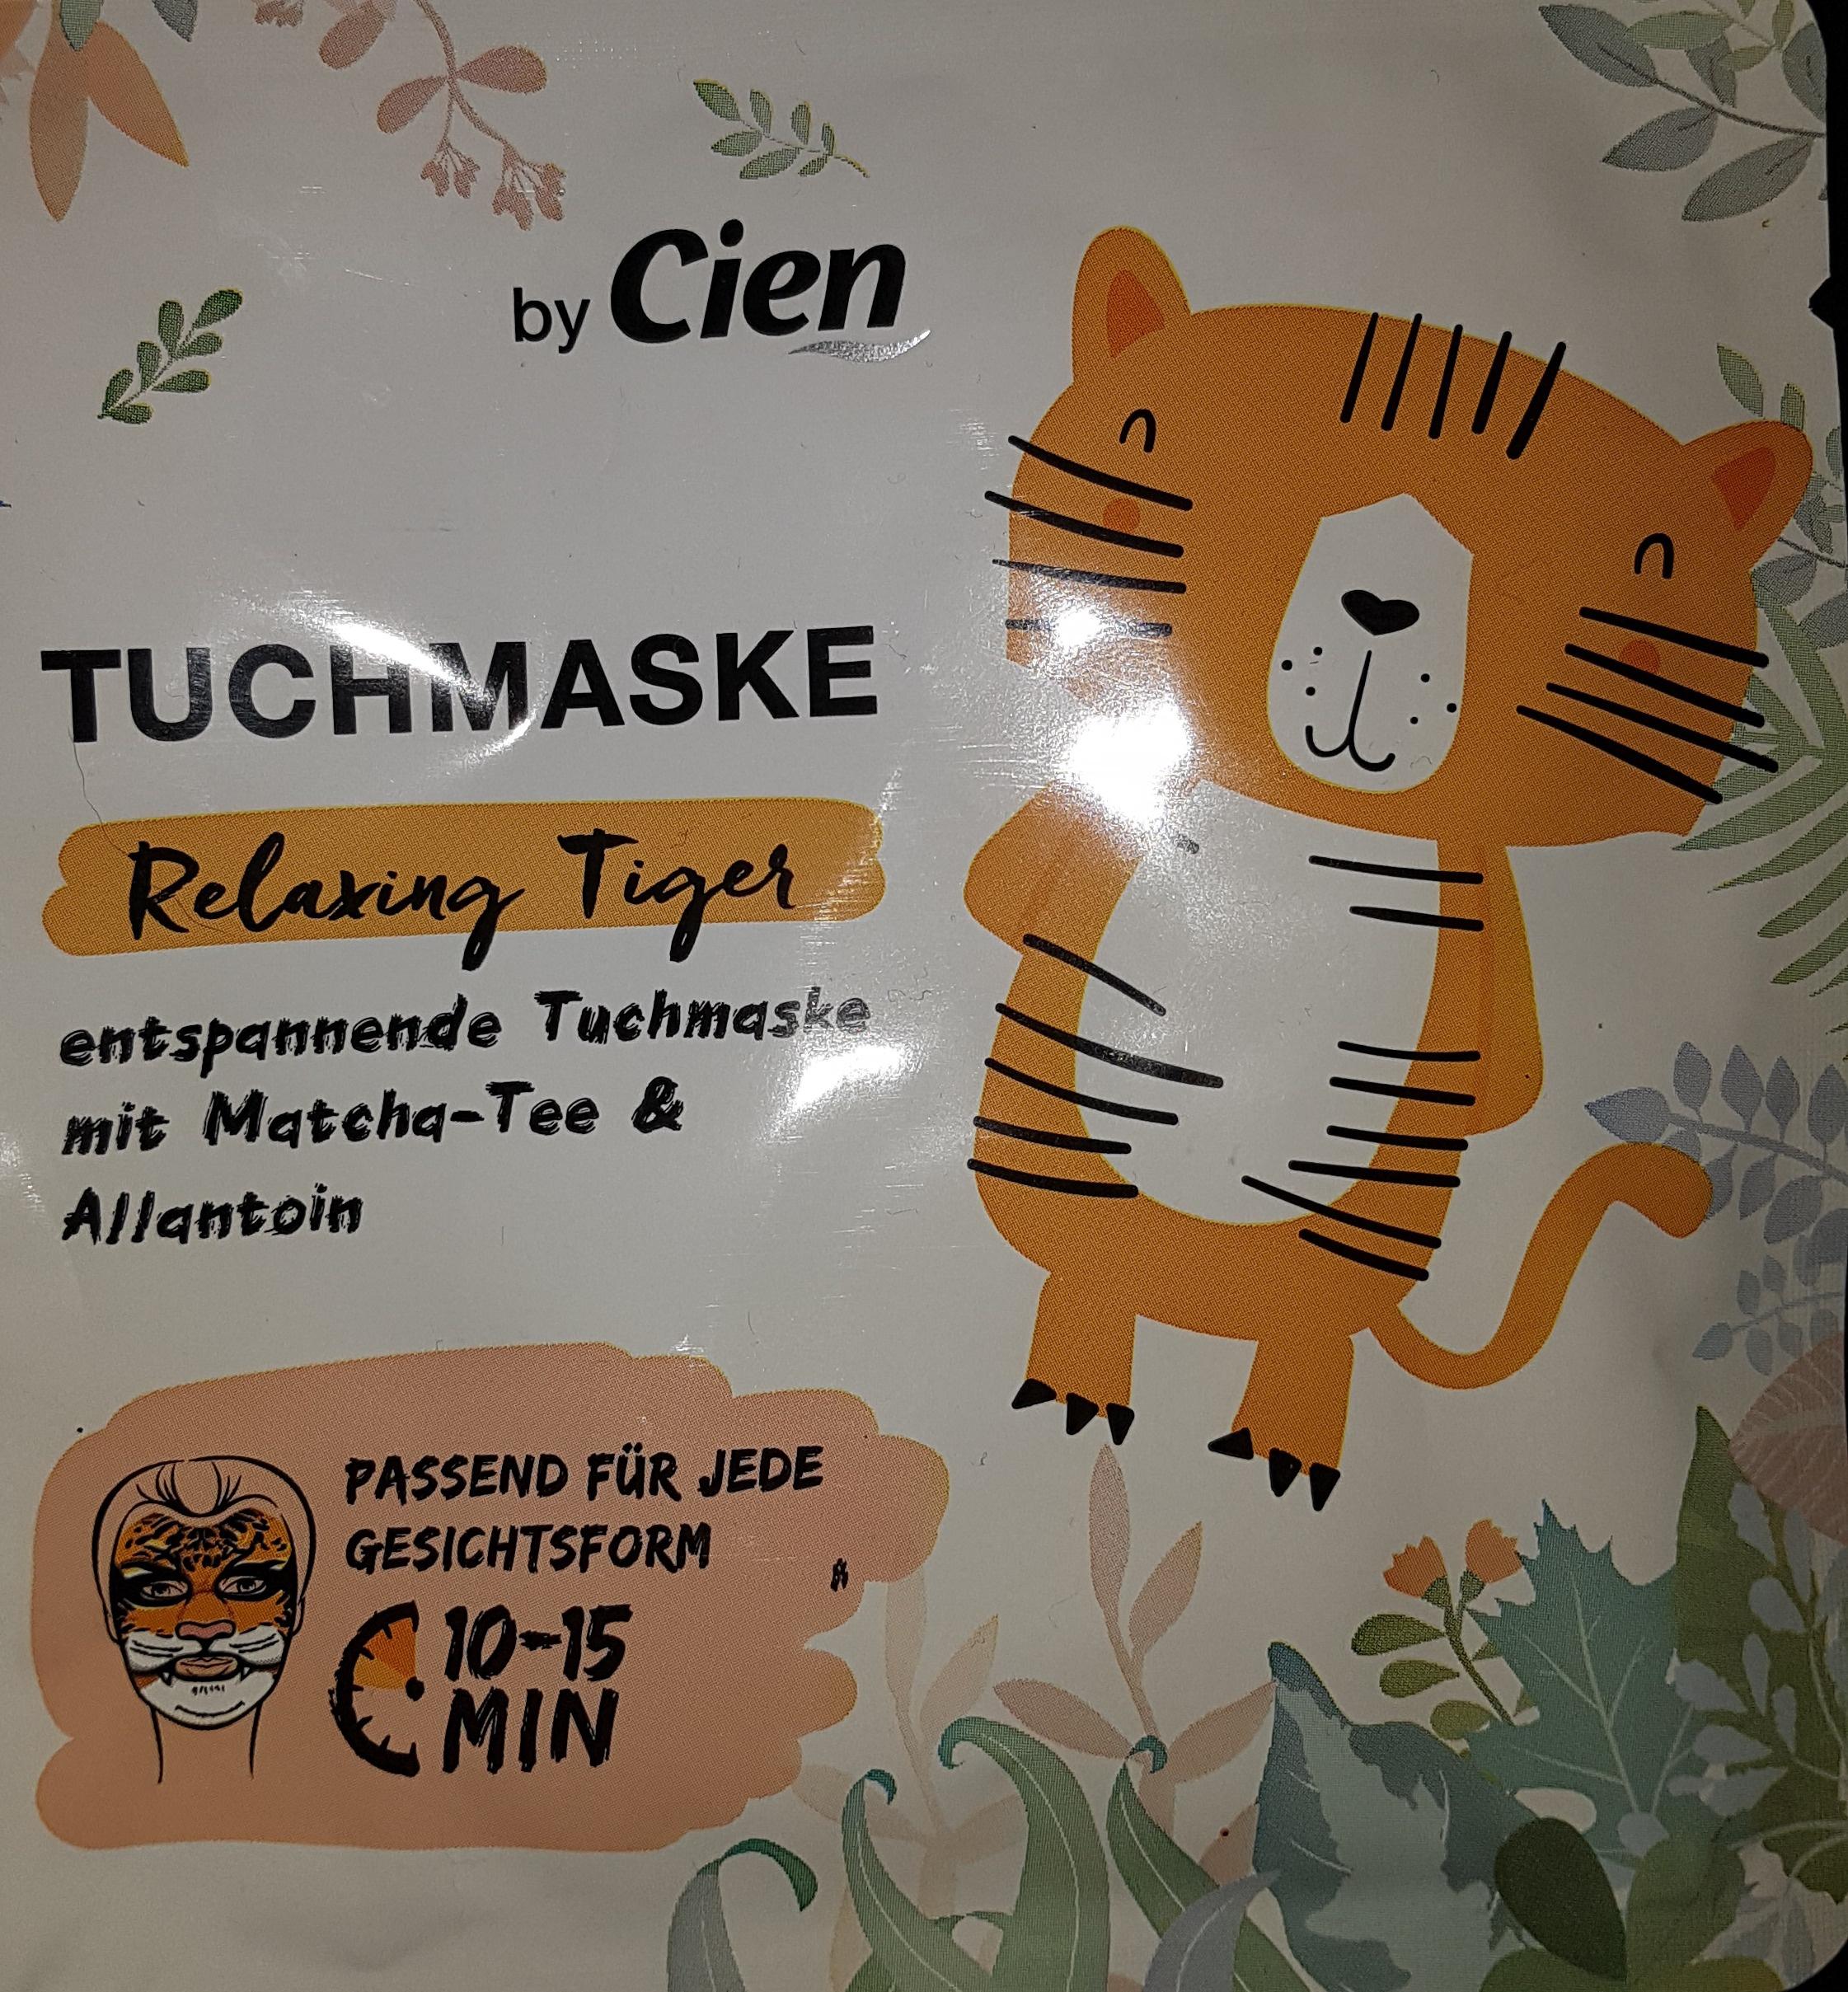 Cien Tuchmaske Relaxing Tiger